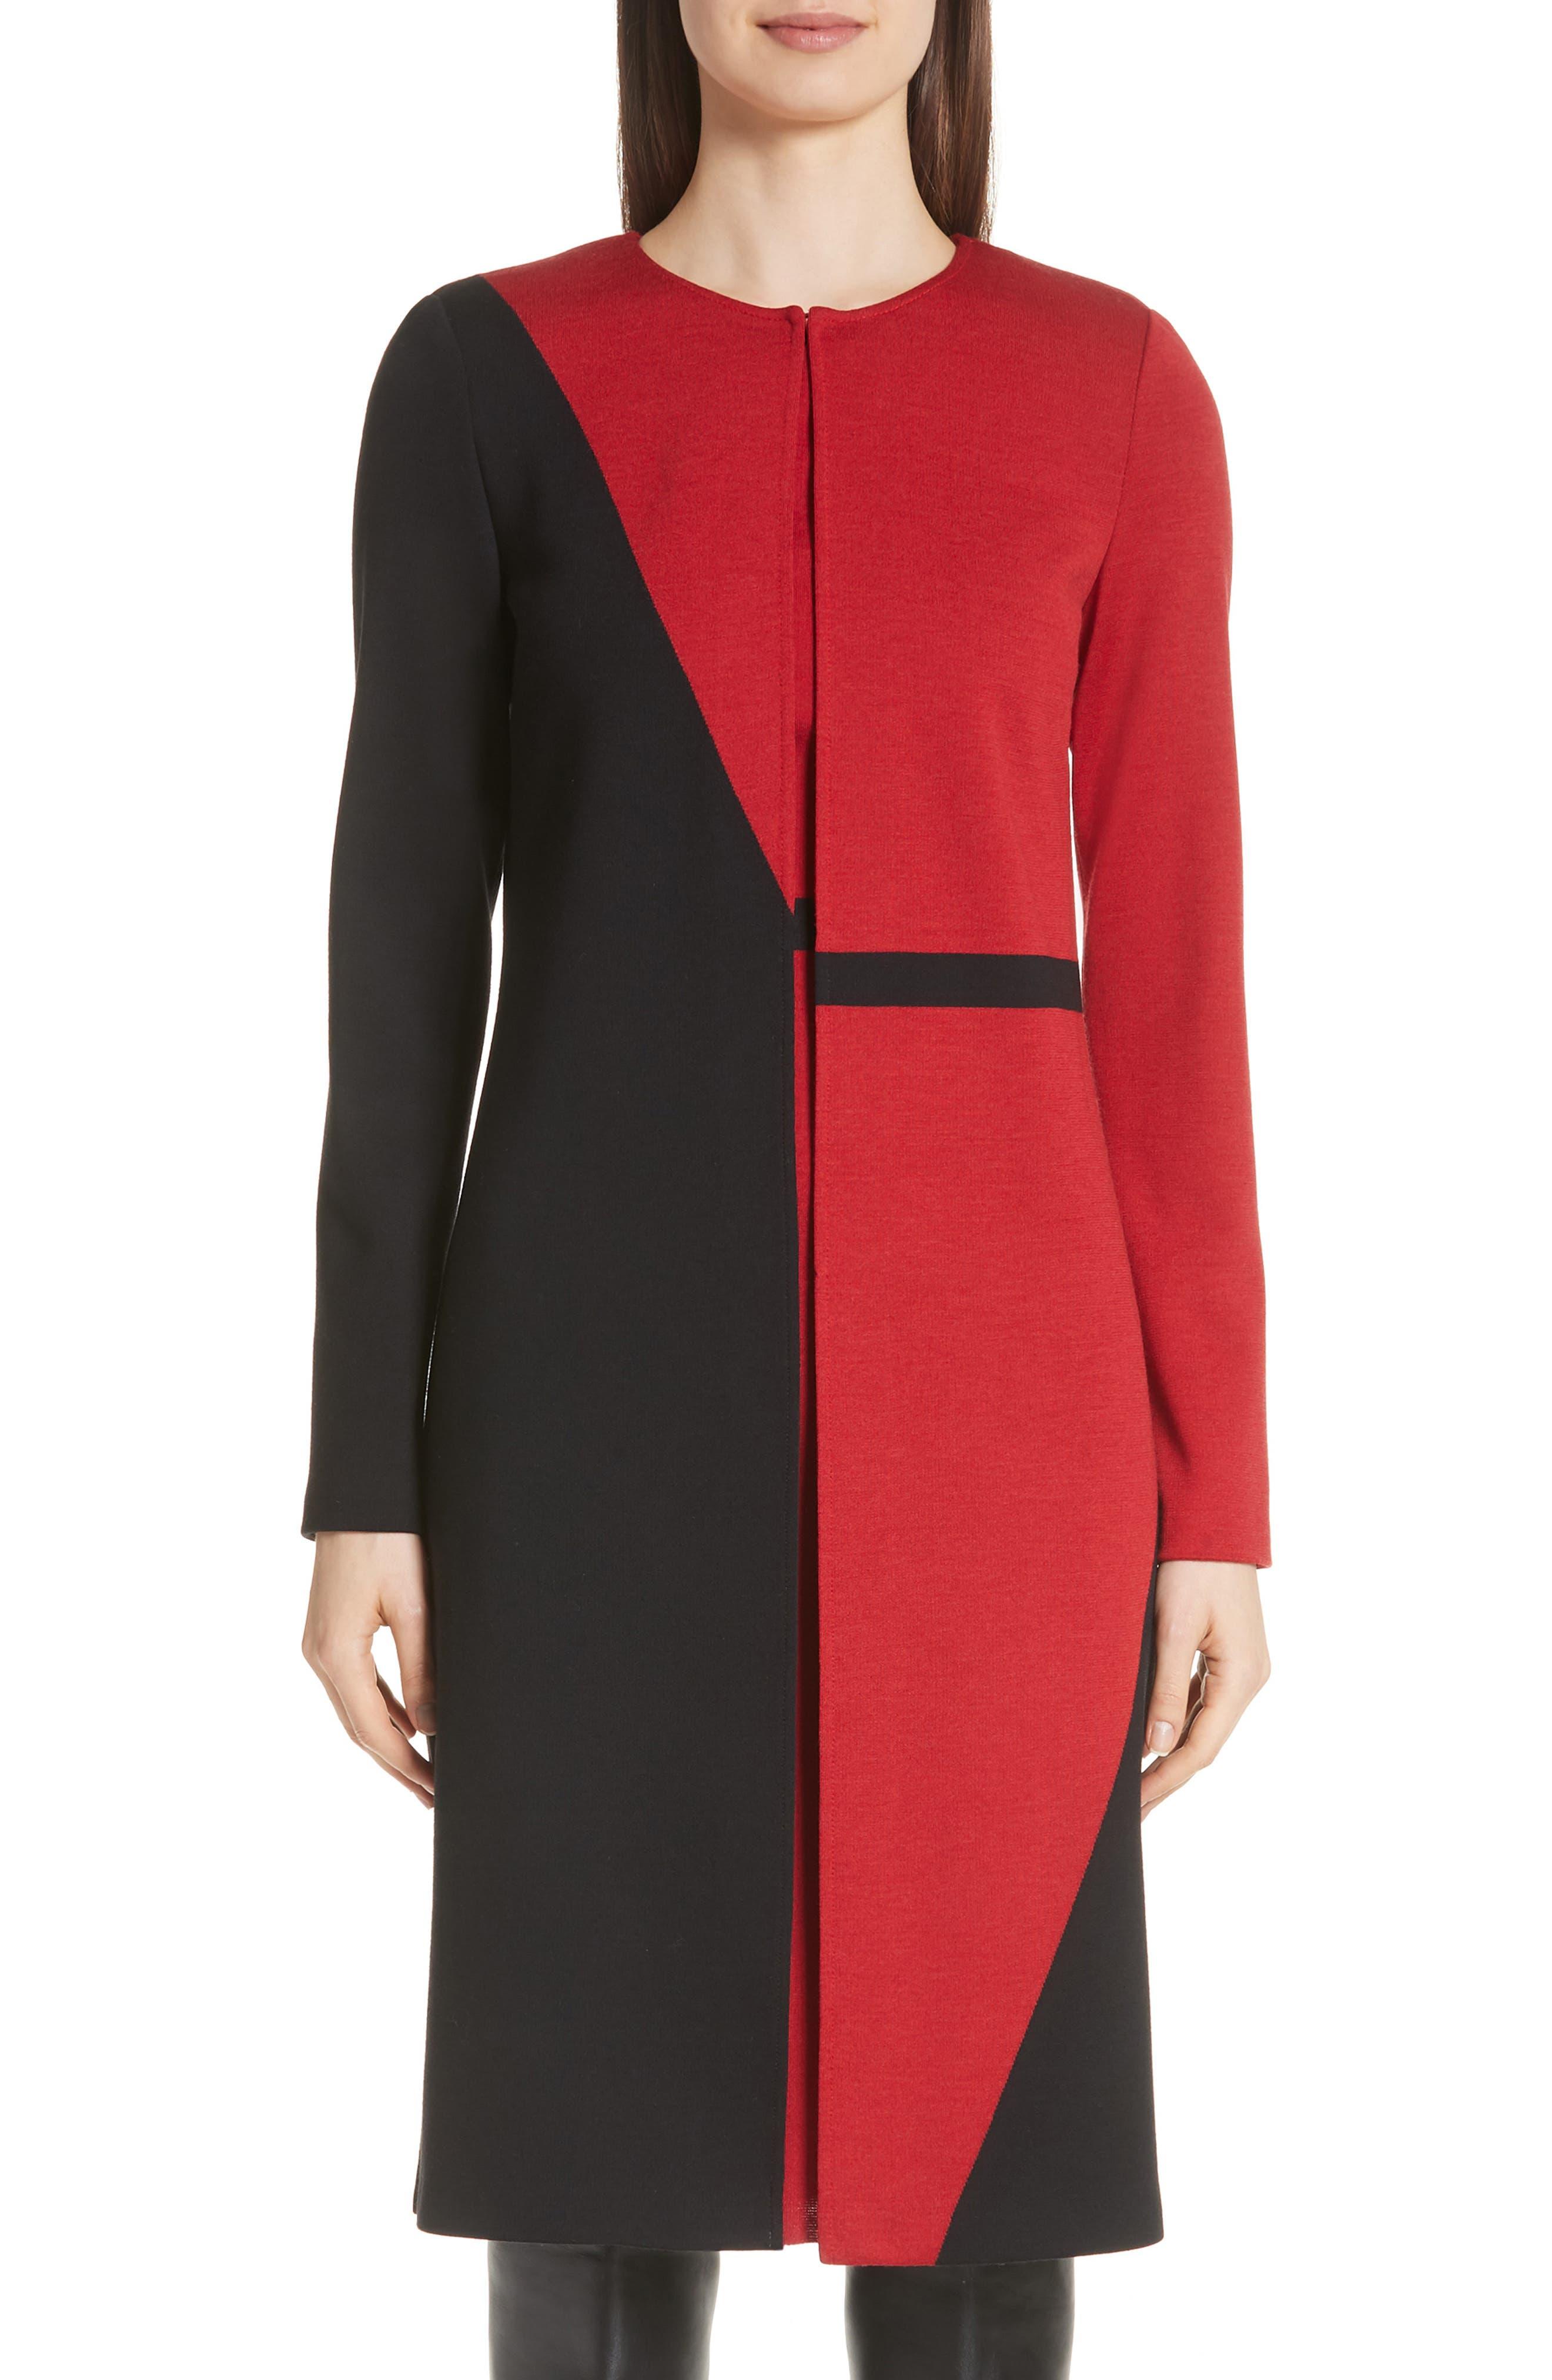 ST. JOHN Slanted Colorblock Milano Knit Topper Jacket in Caviar/ Burnt Red